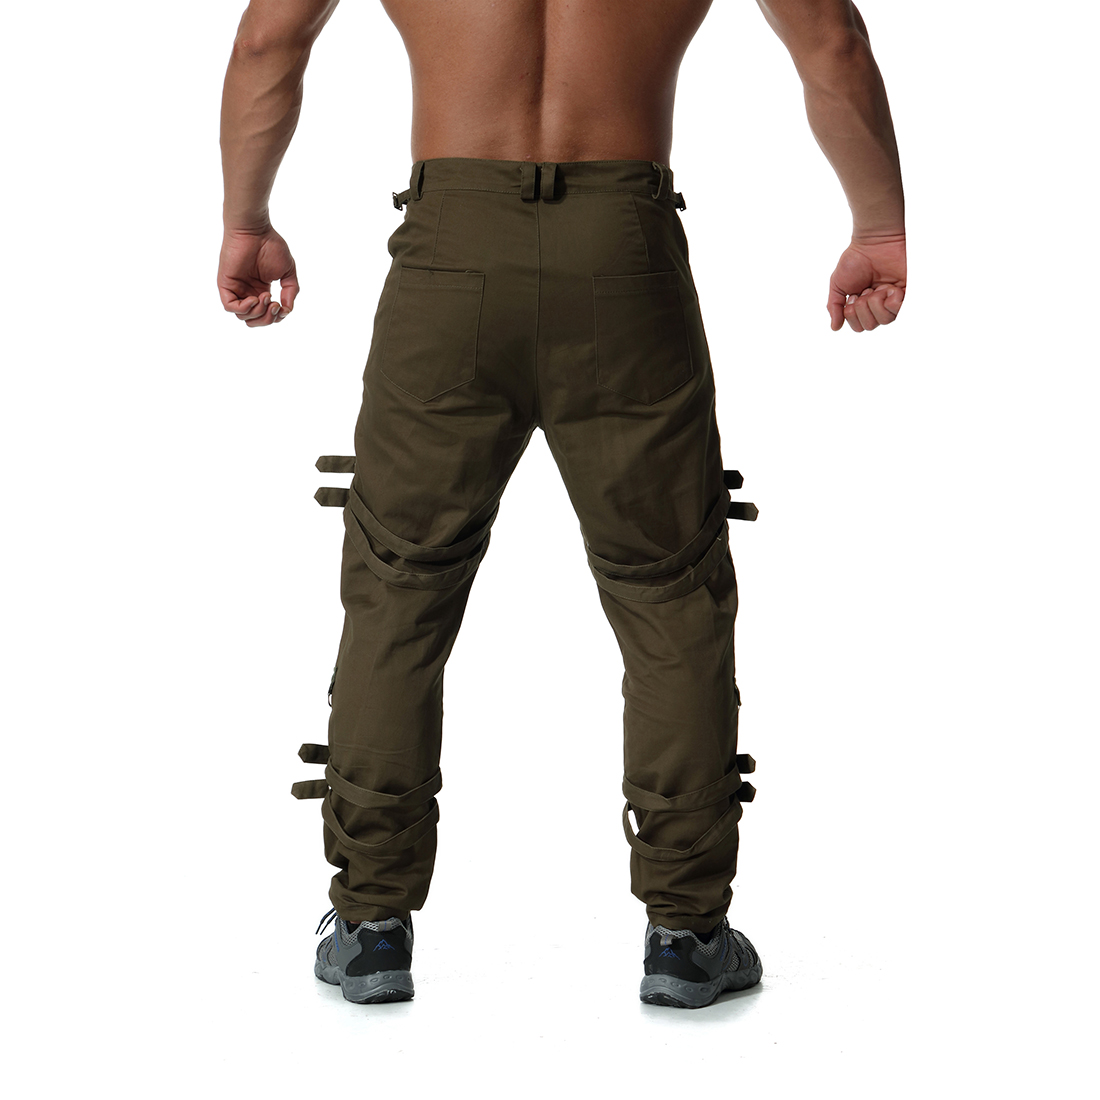 Pantalones para hombre, pantalones de chándal, pantalones de chándal, pantalones para hombre, hip hop, Camuflaje, pantalones tácticos de carga, Militar - 2